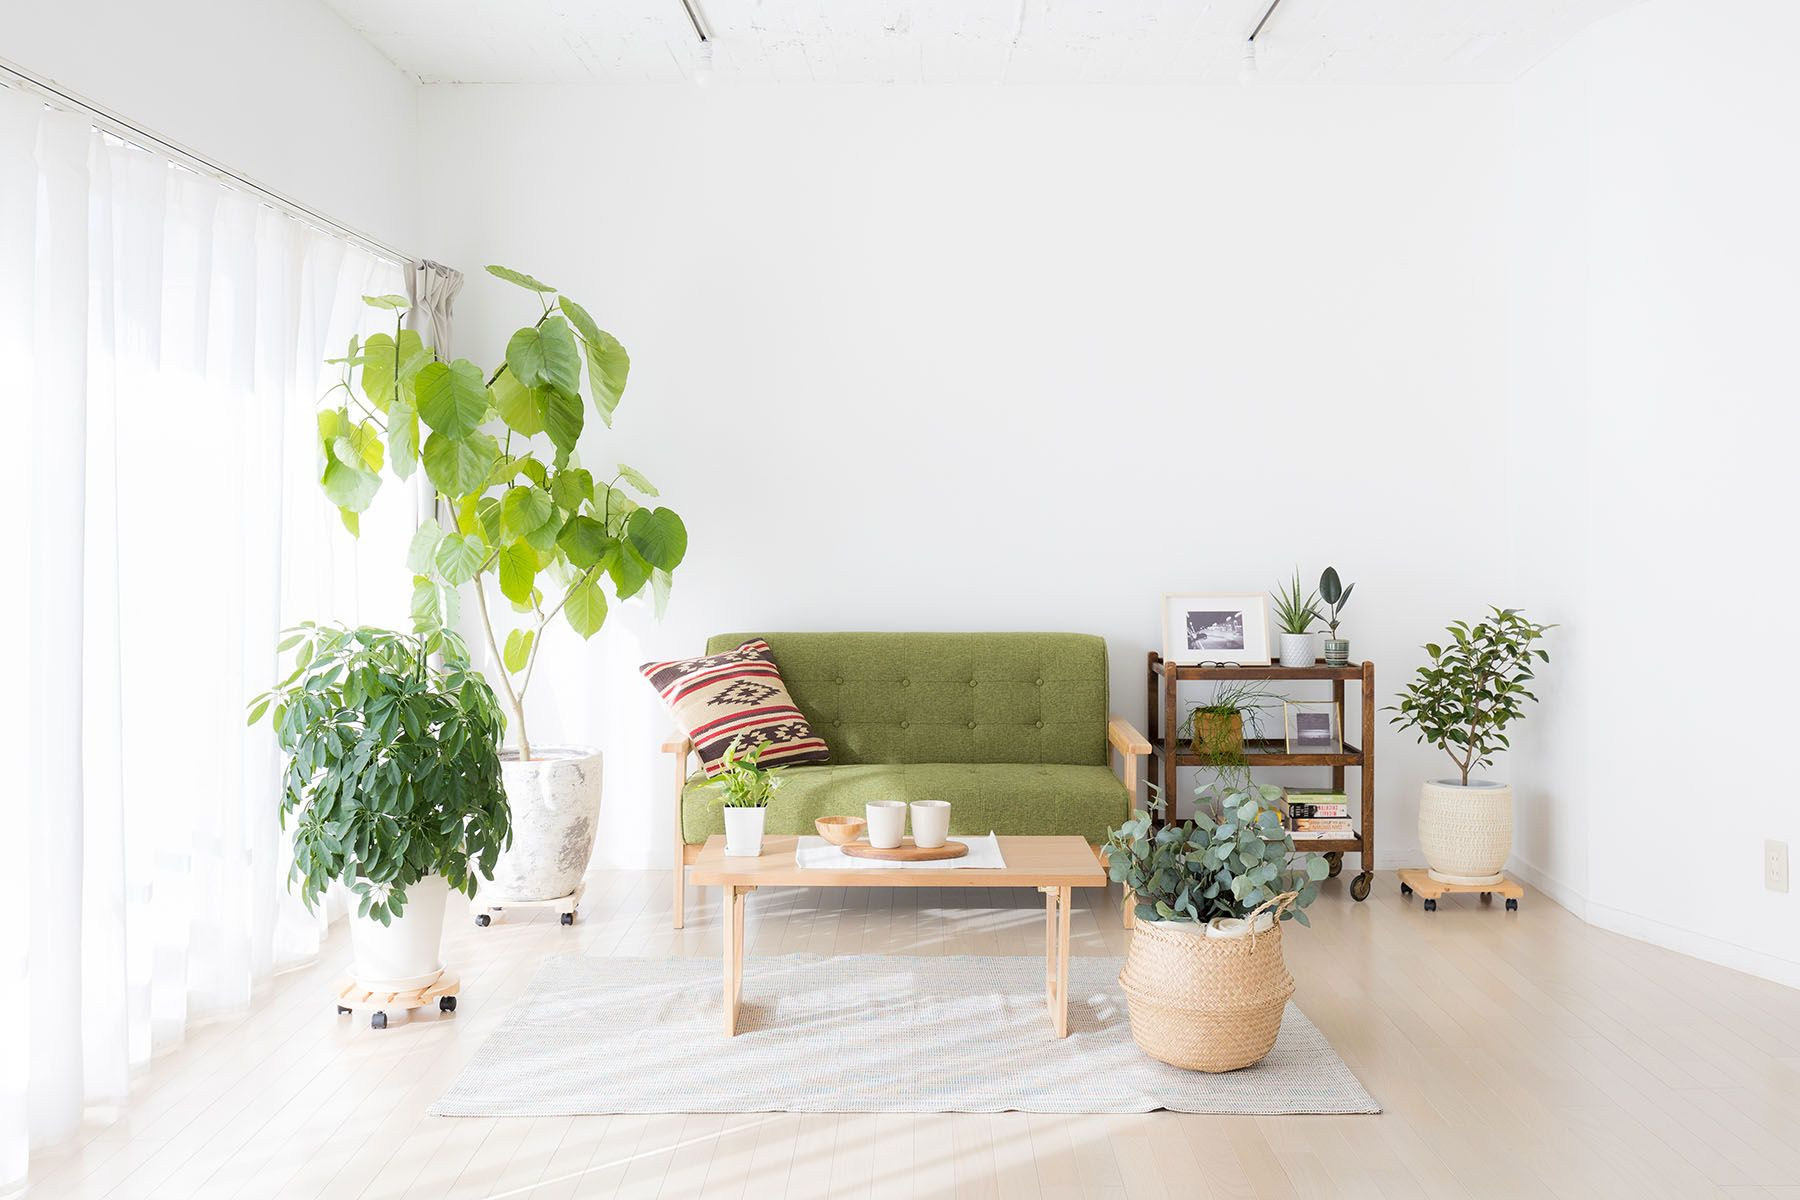 Studio Serato 代々木 (スタジオセラート代々木)大きい窓と木目の壁が柔らかな空間